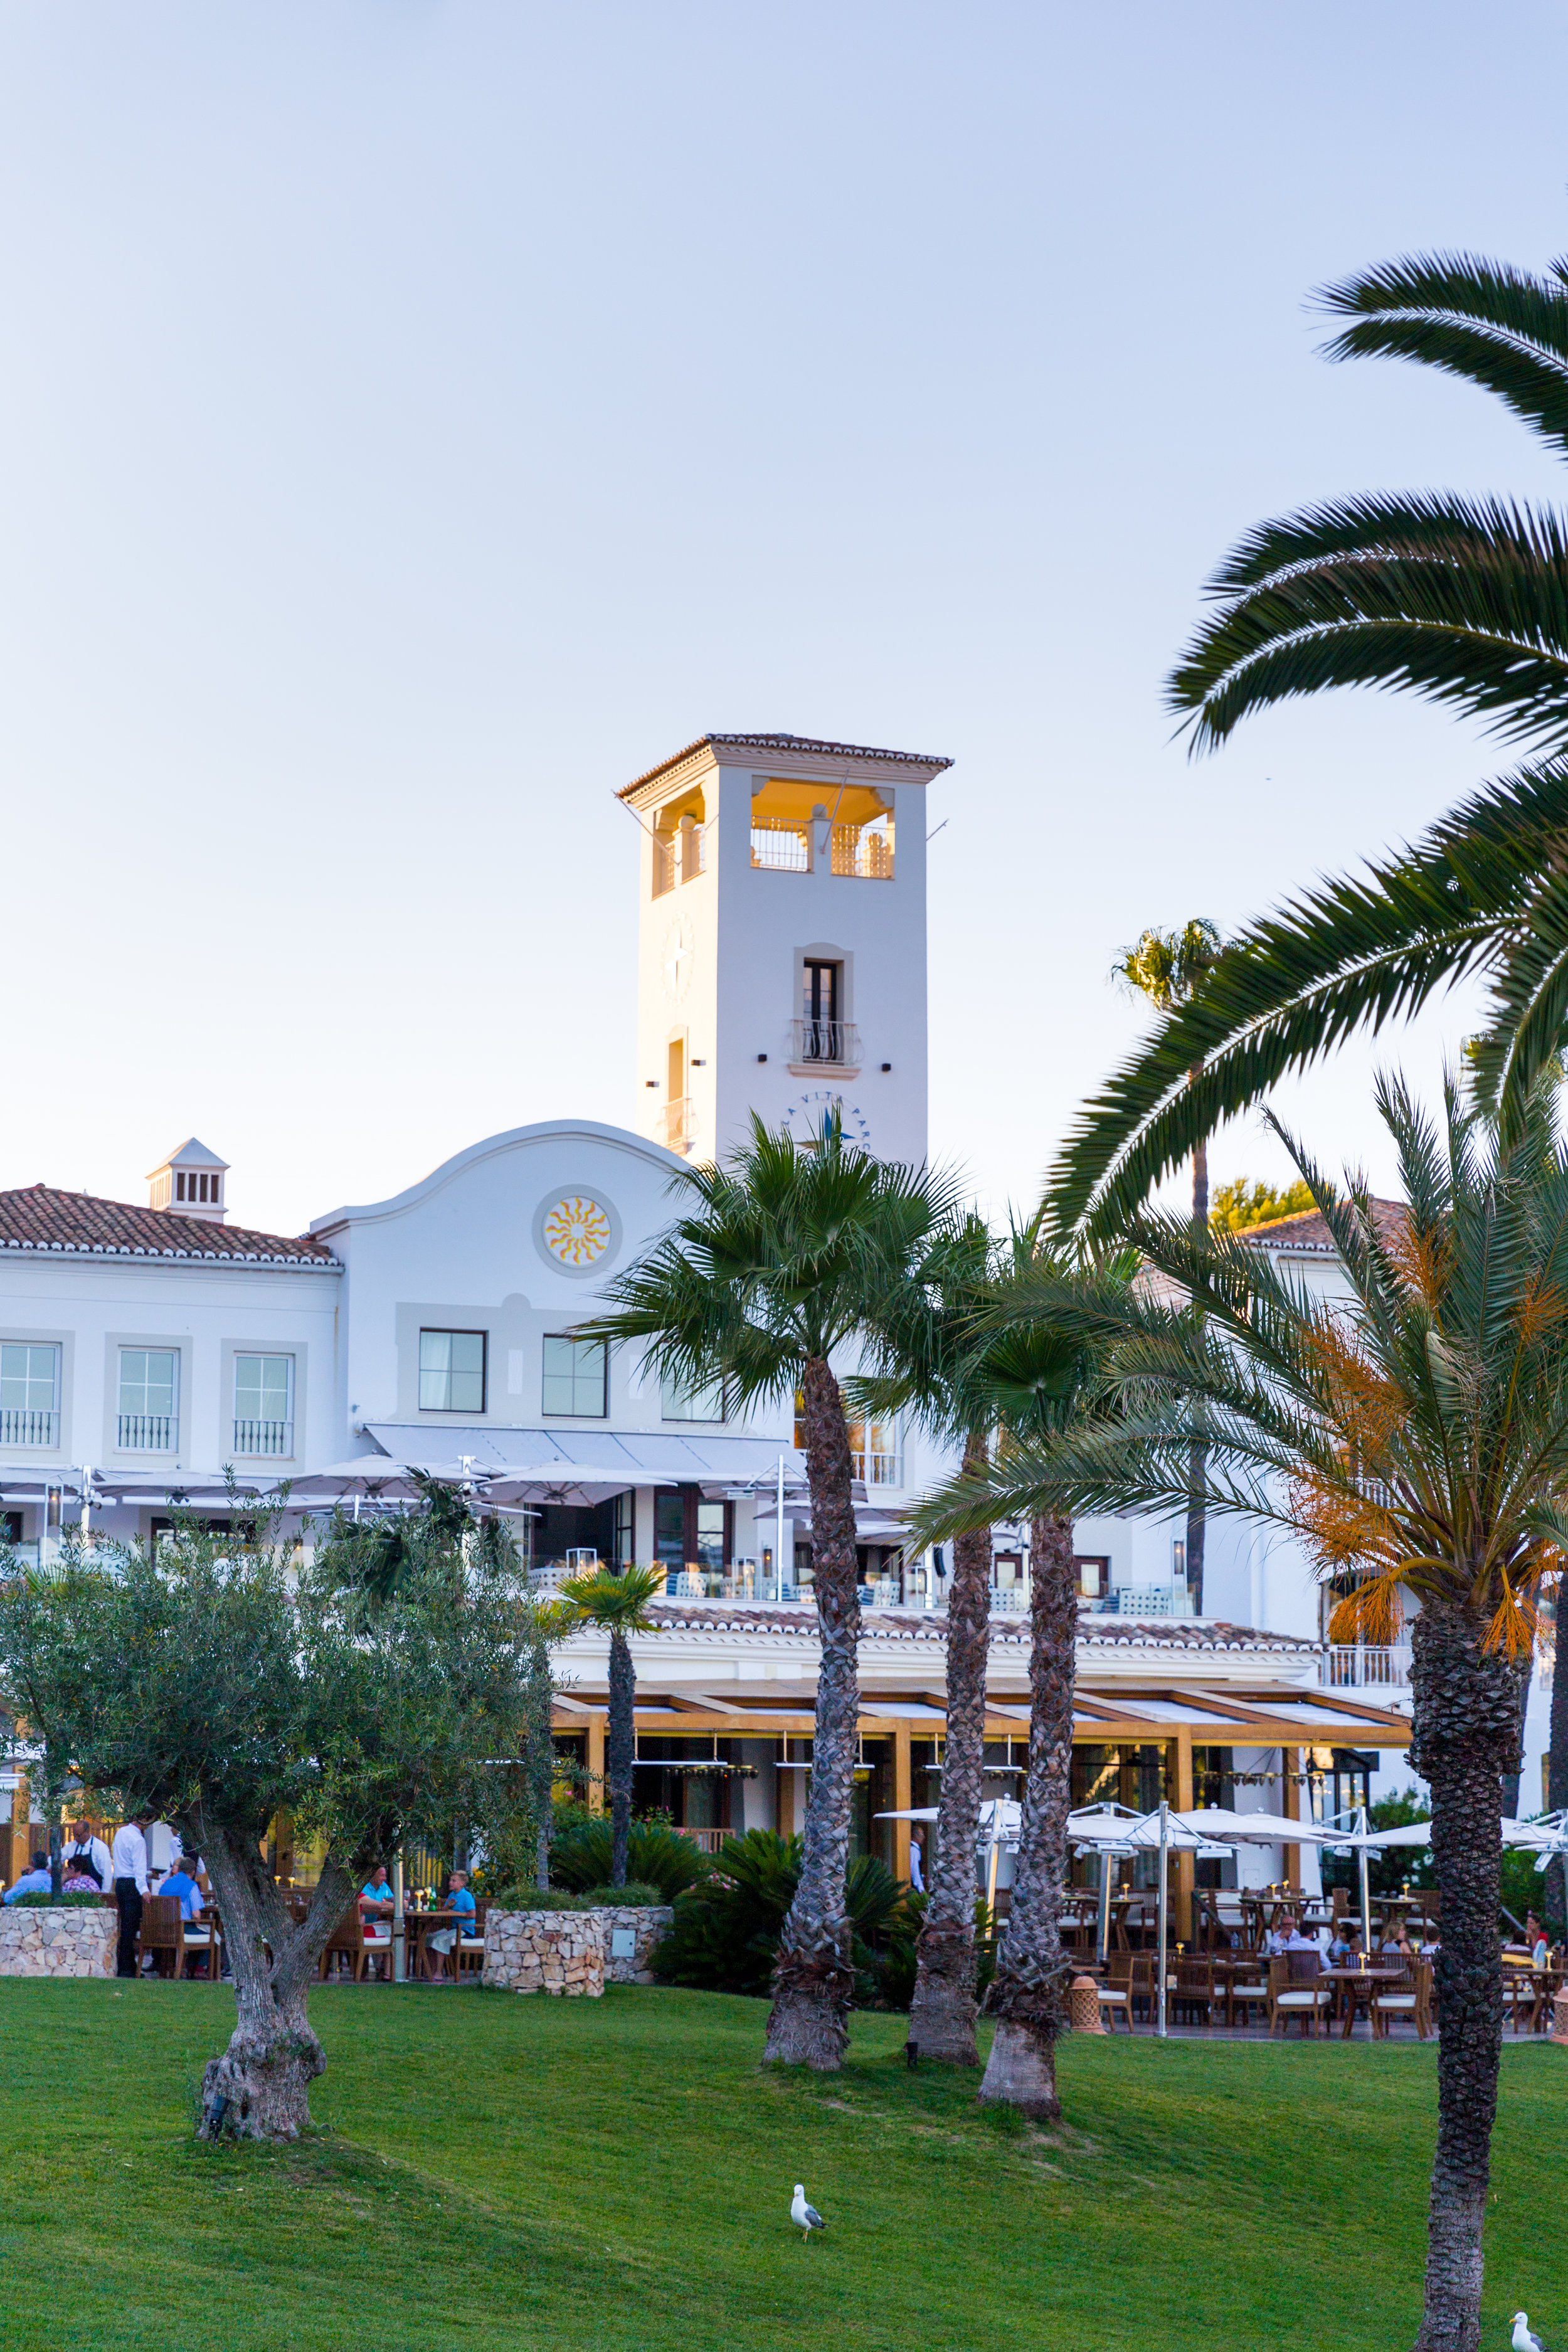 Portugal Algarve Summer Coast-7.jpg